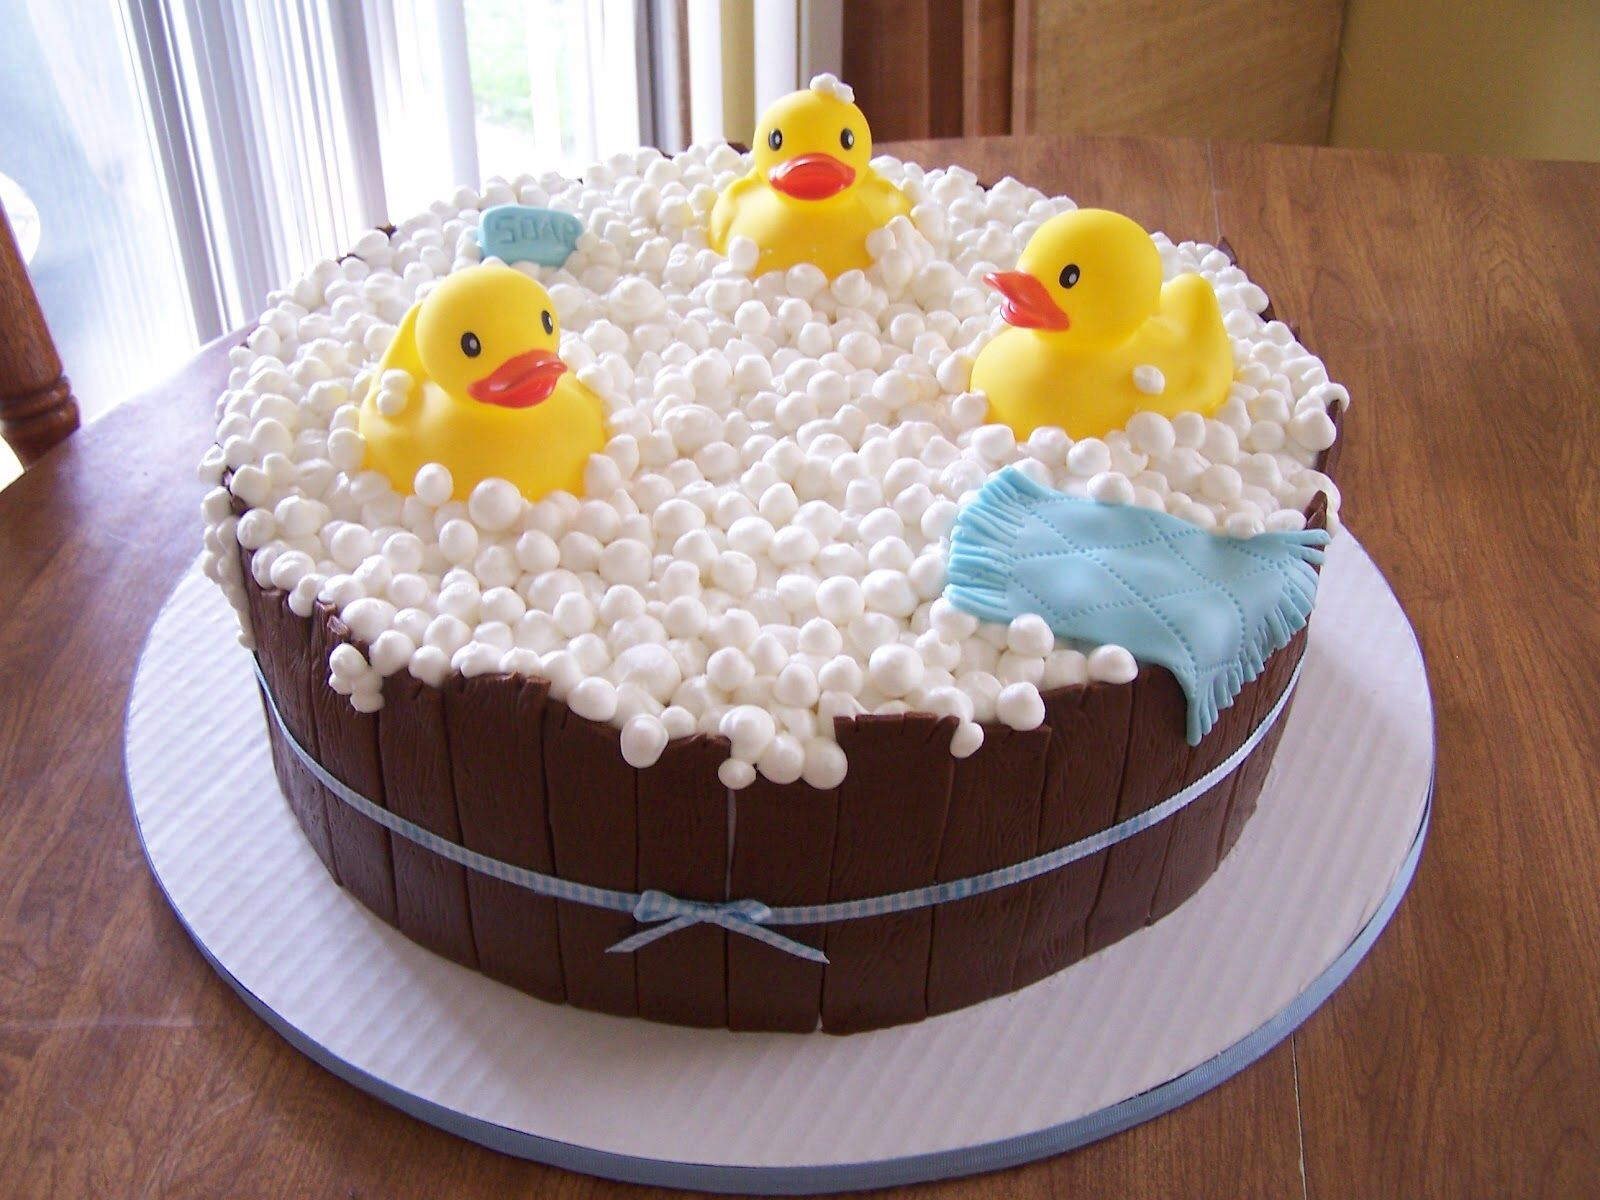 Rubber ducky cake shower ideas Pinterest Rubber ducky cake